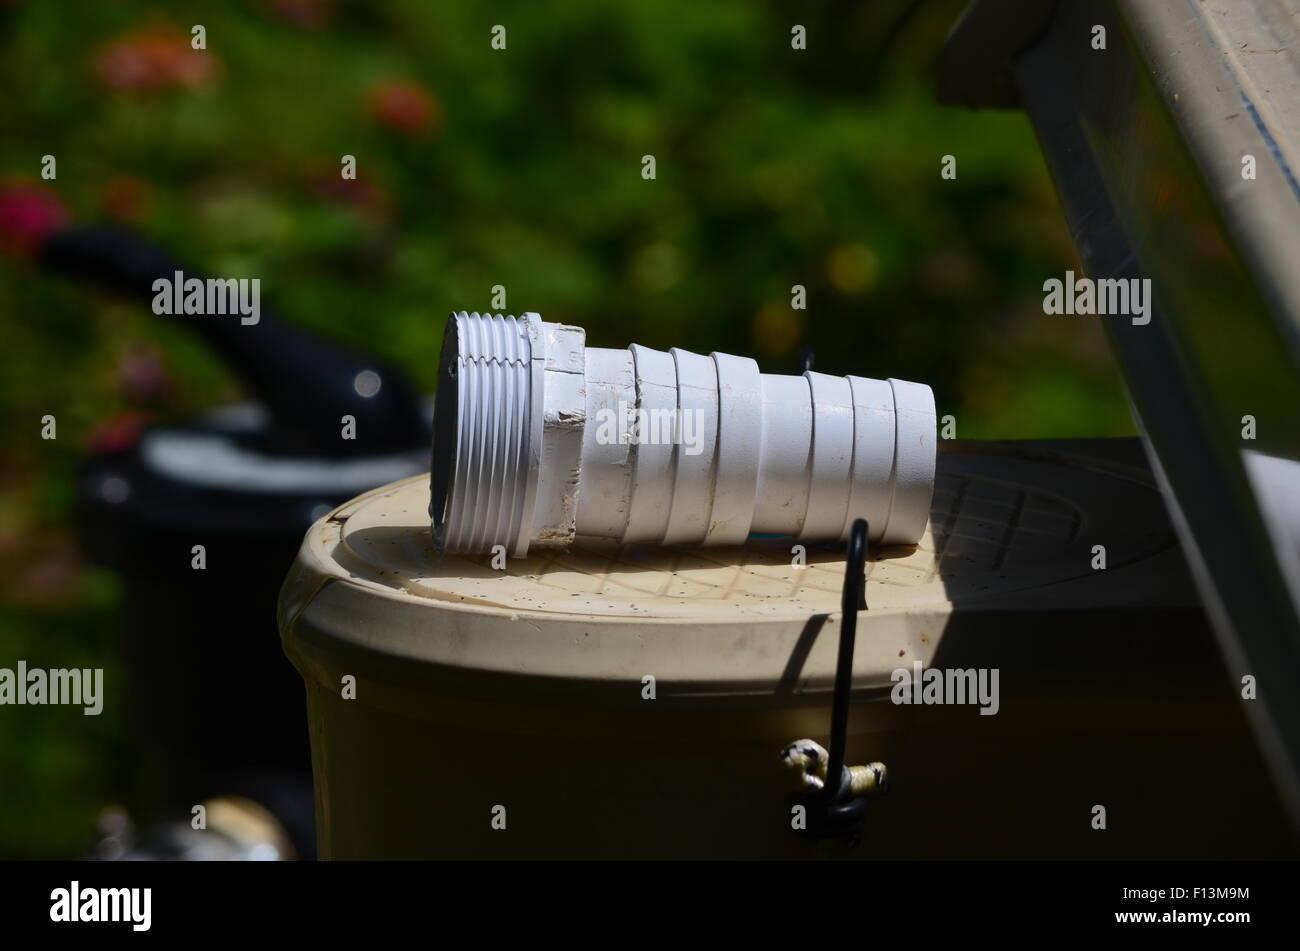 Plumbing fitting - Stock Image